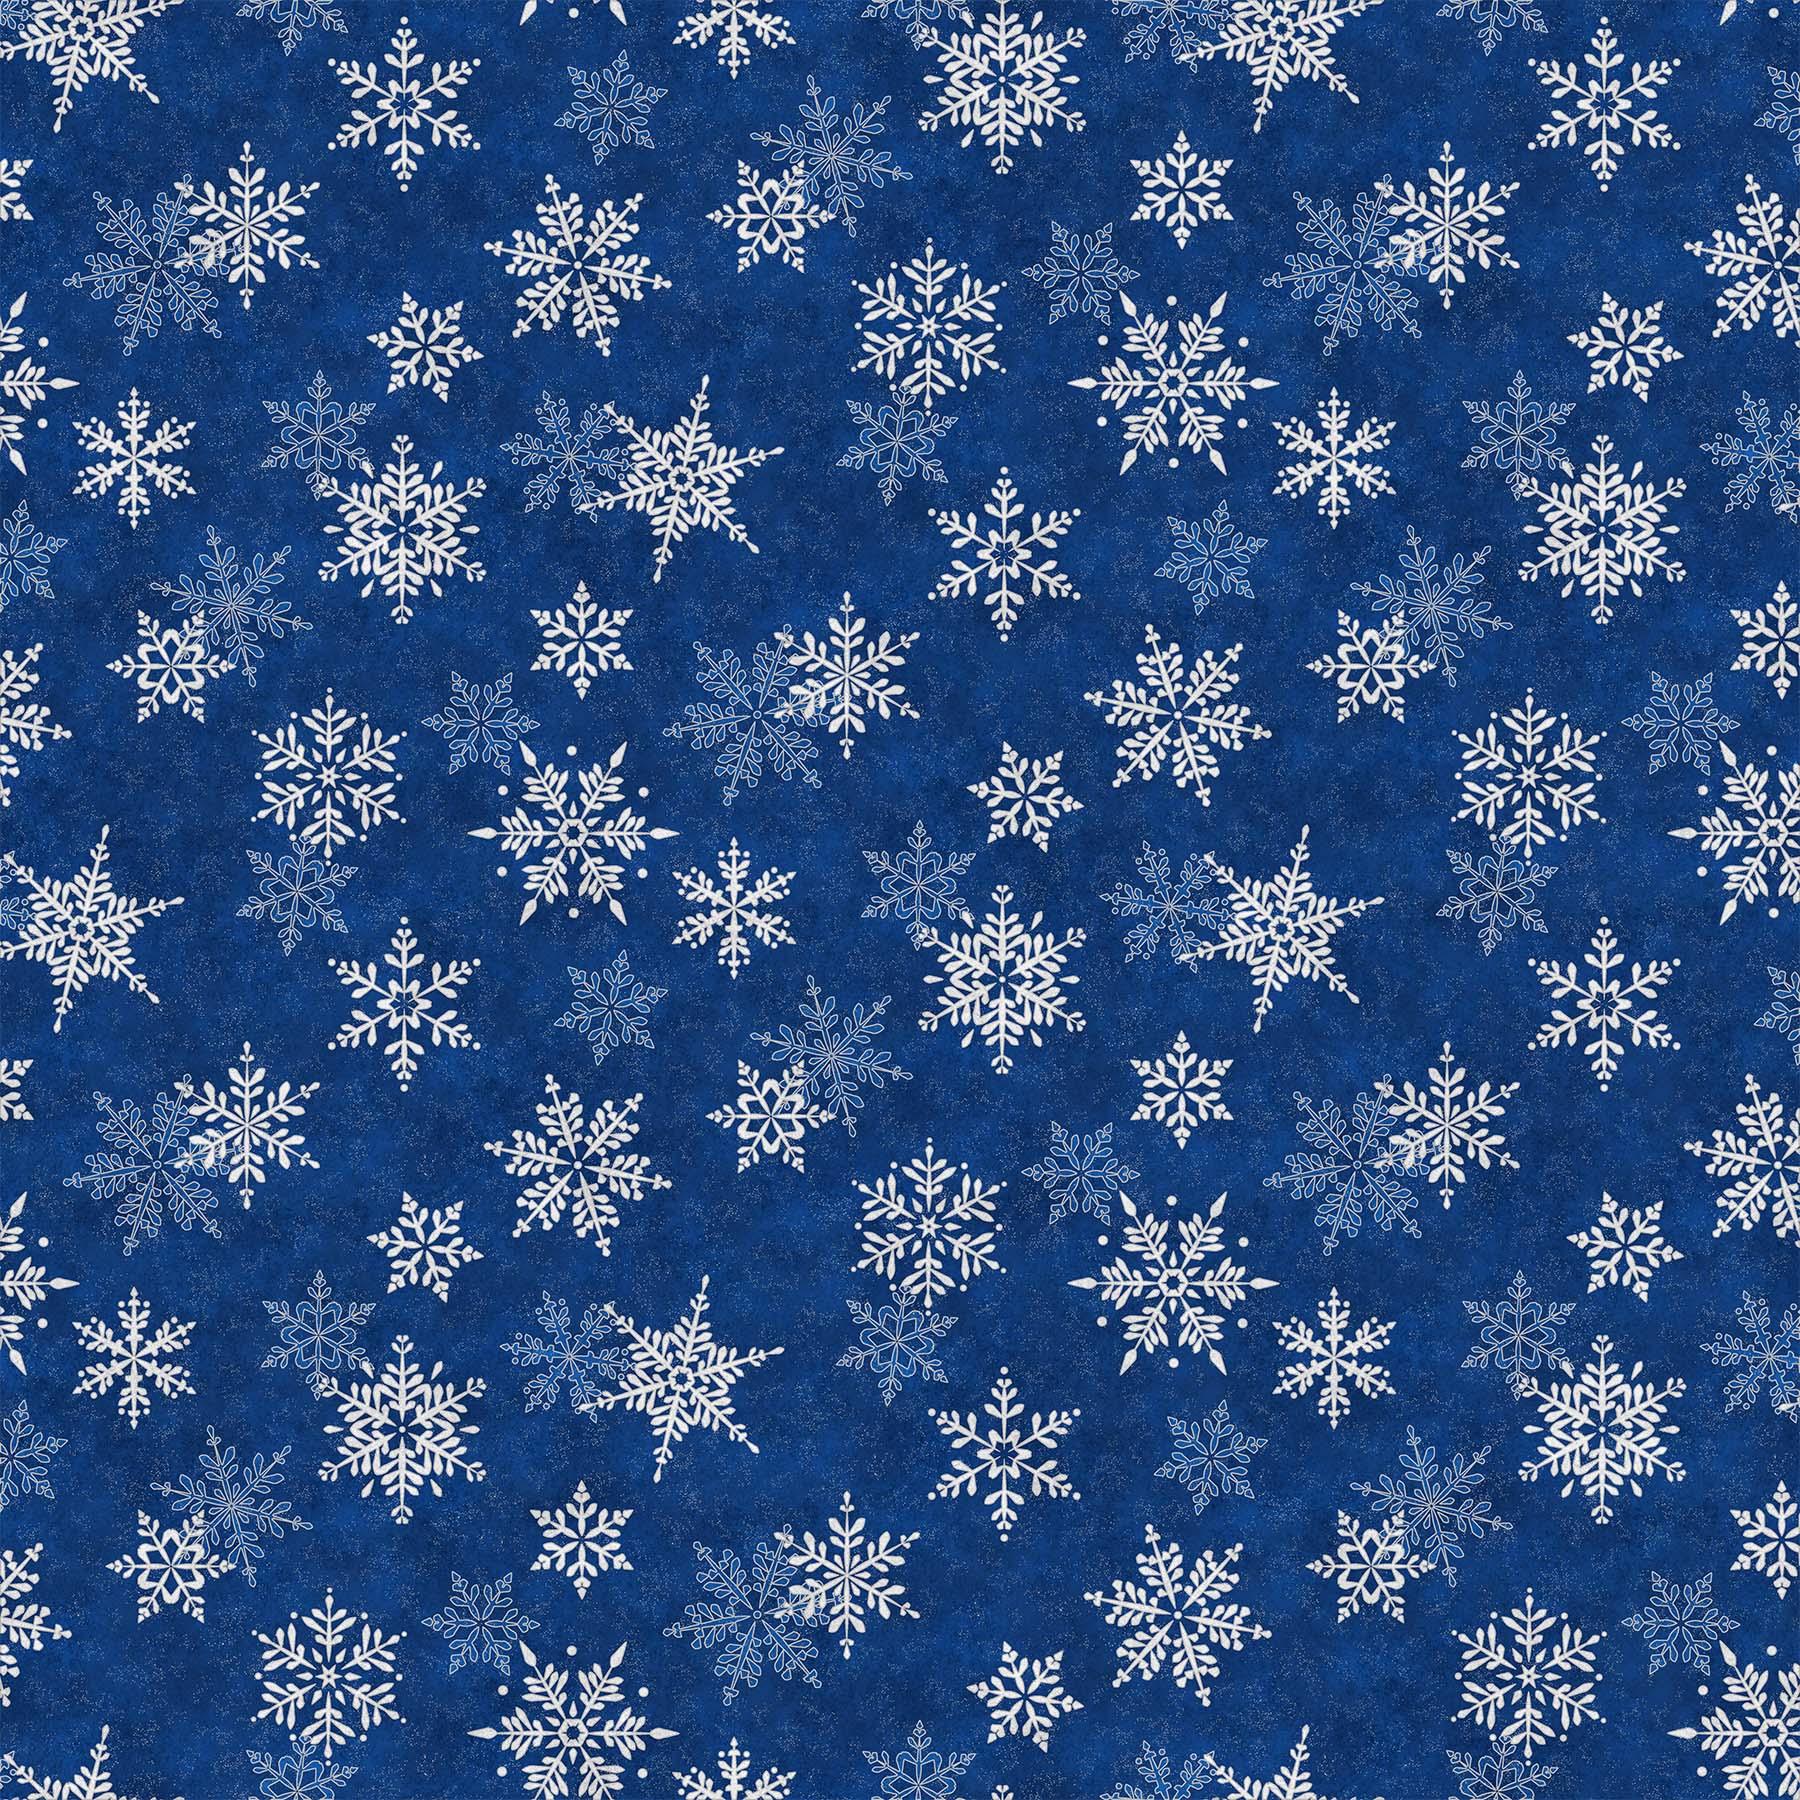 SHIMMER FROST DARK BLUE SILVERLARGE SNOWFLAKE